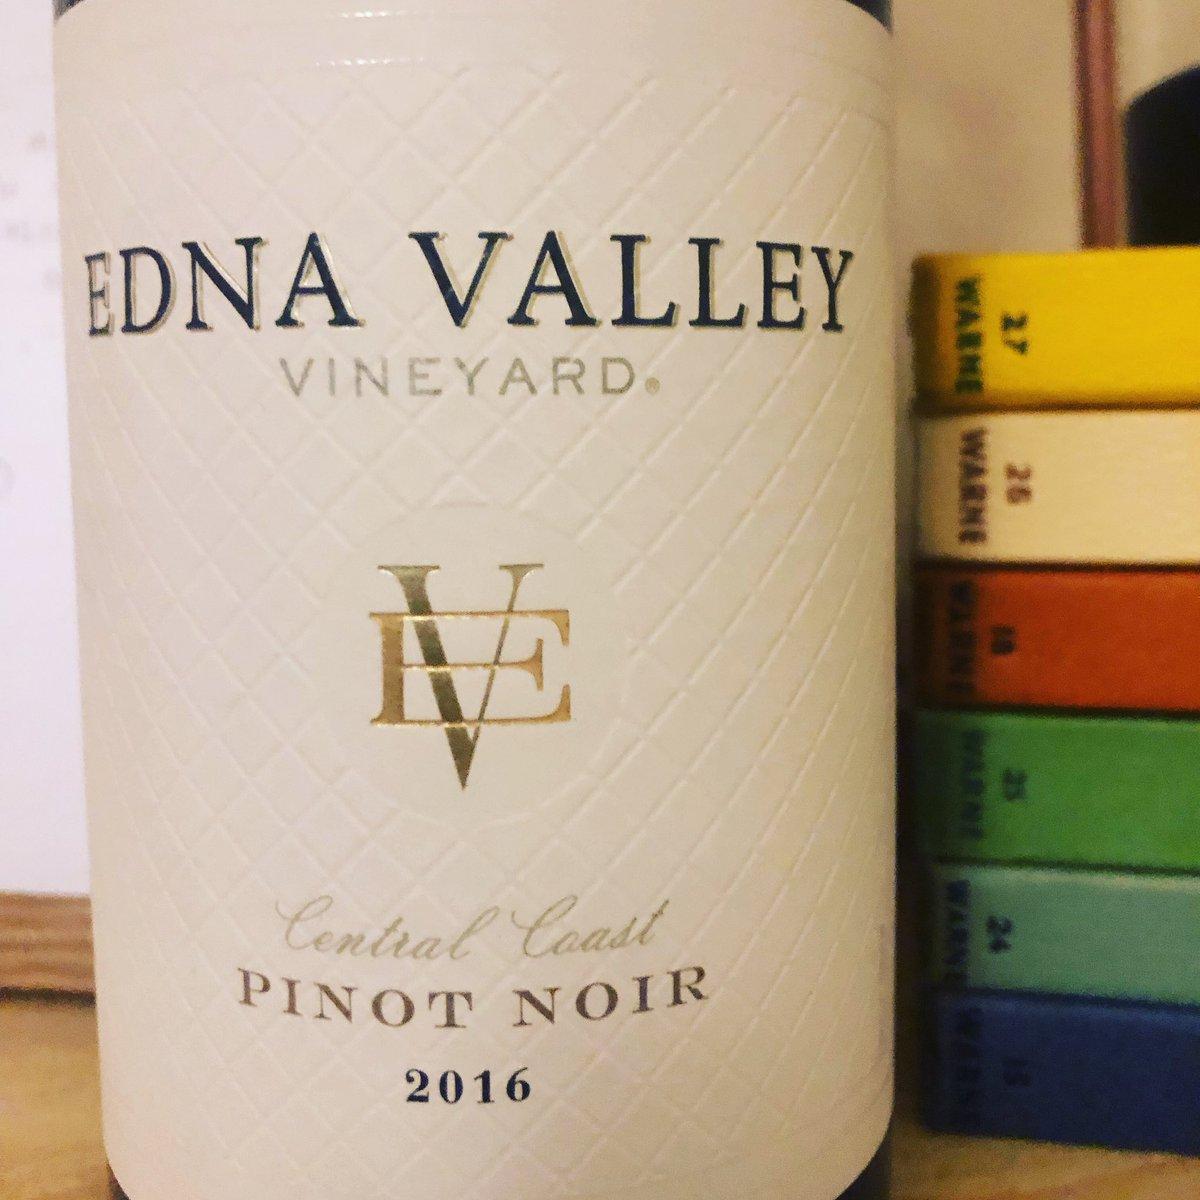 Tonight's wine from @EdnaValley  #ukwinehour #ednavalley #wine #winelovers